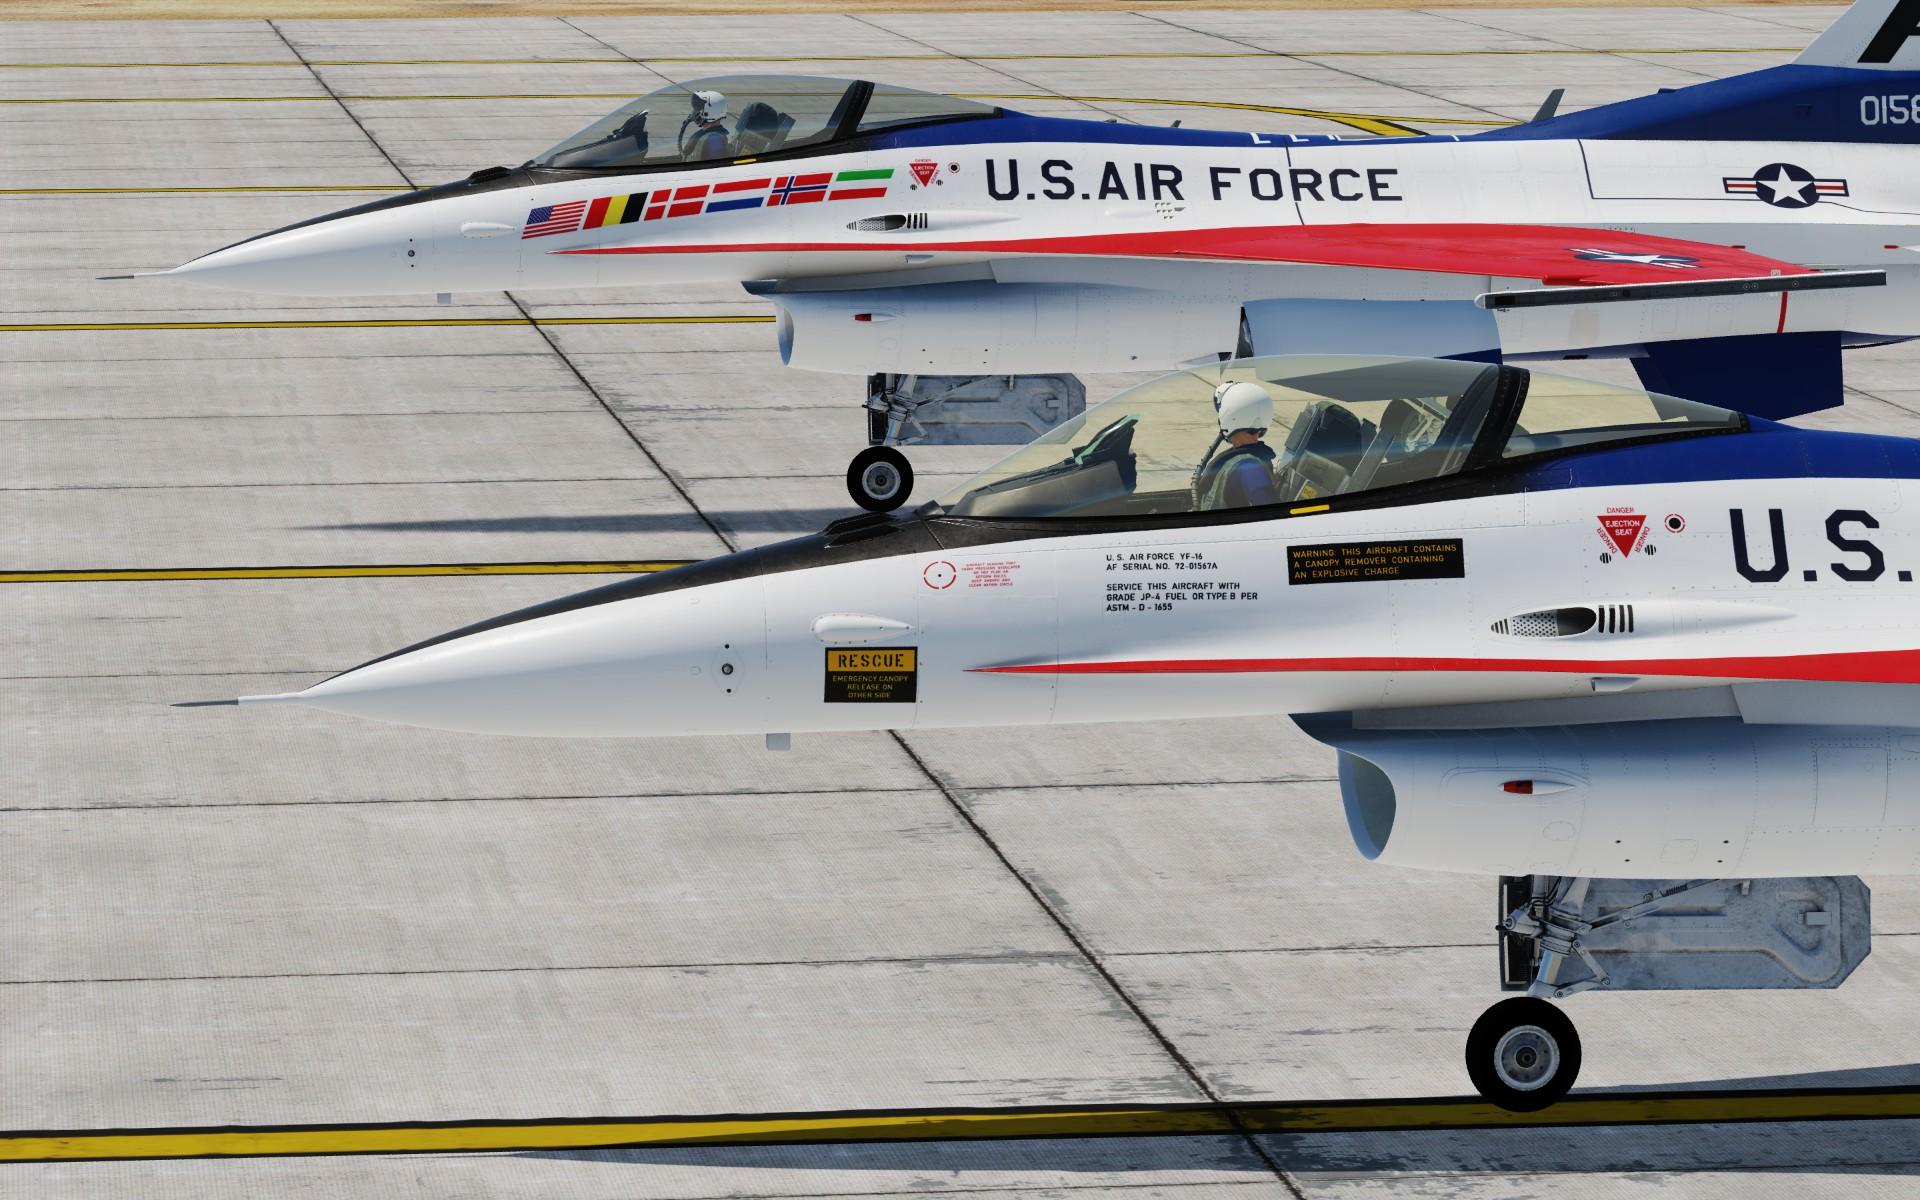 General Dynamics Announces Gulfstream G600 Granted FAA